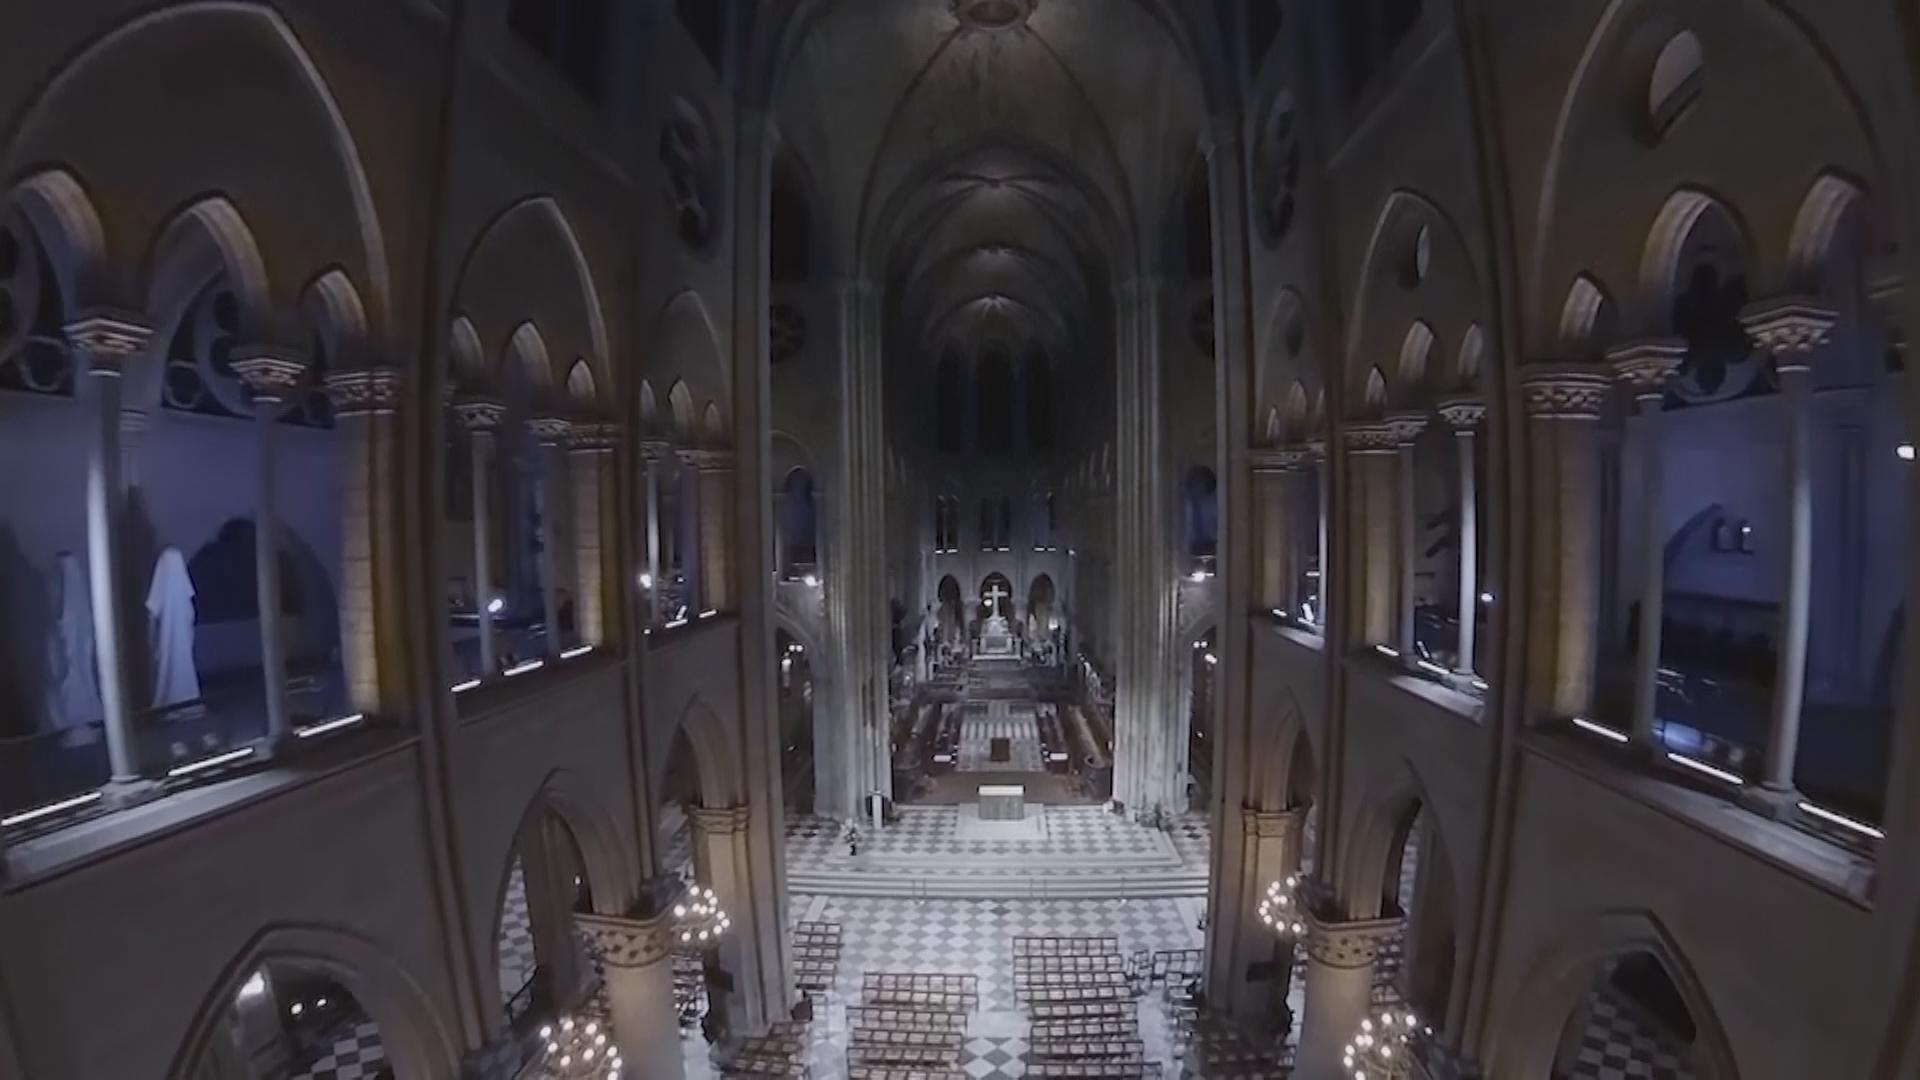 Ted Cruz Gets Burned For Tasteless Disney Princess Tweet About Notre Dame